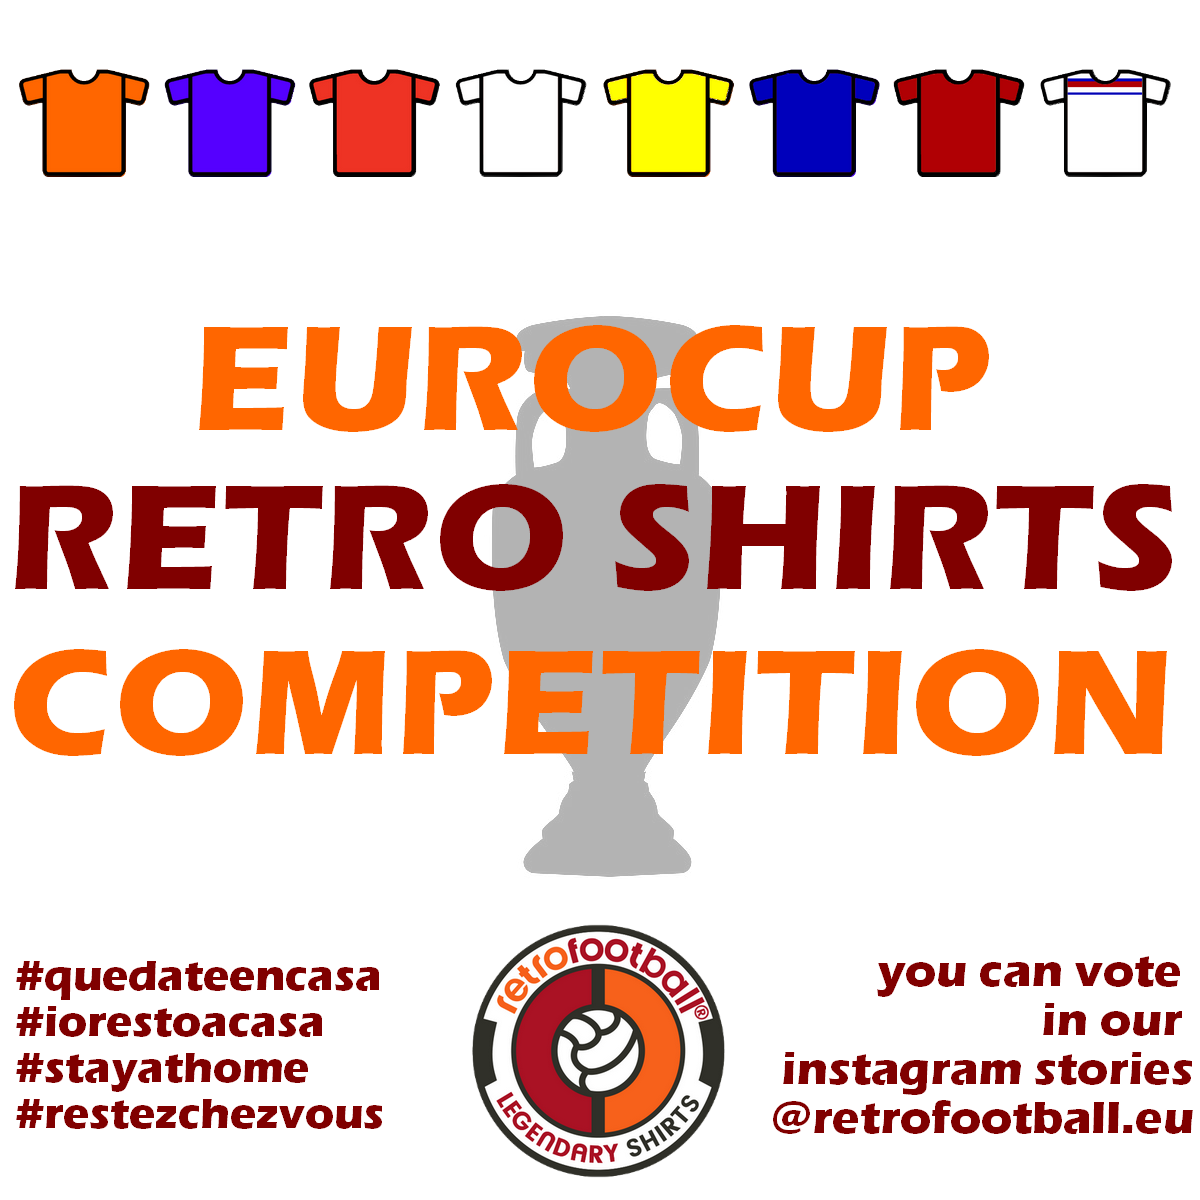 EuroCup Retro Shirts Competition